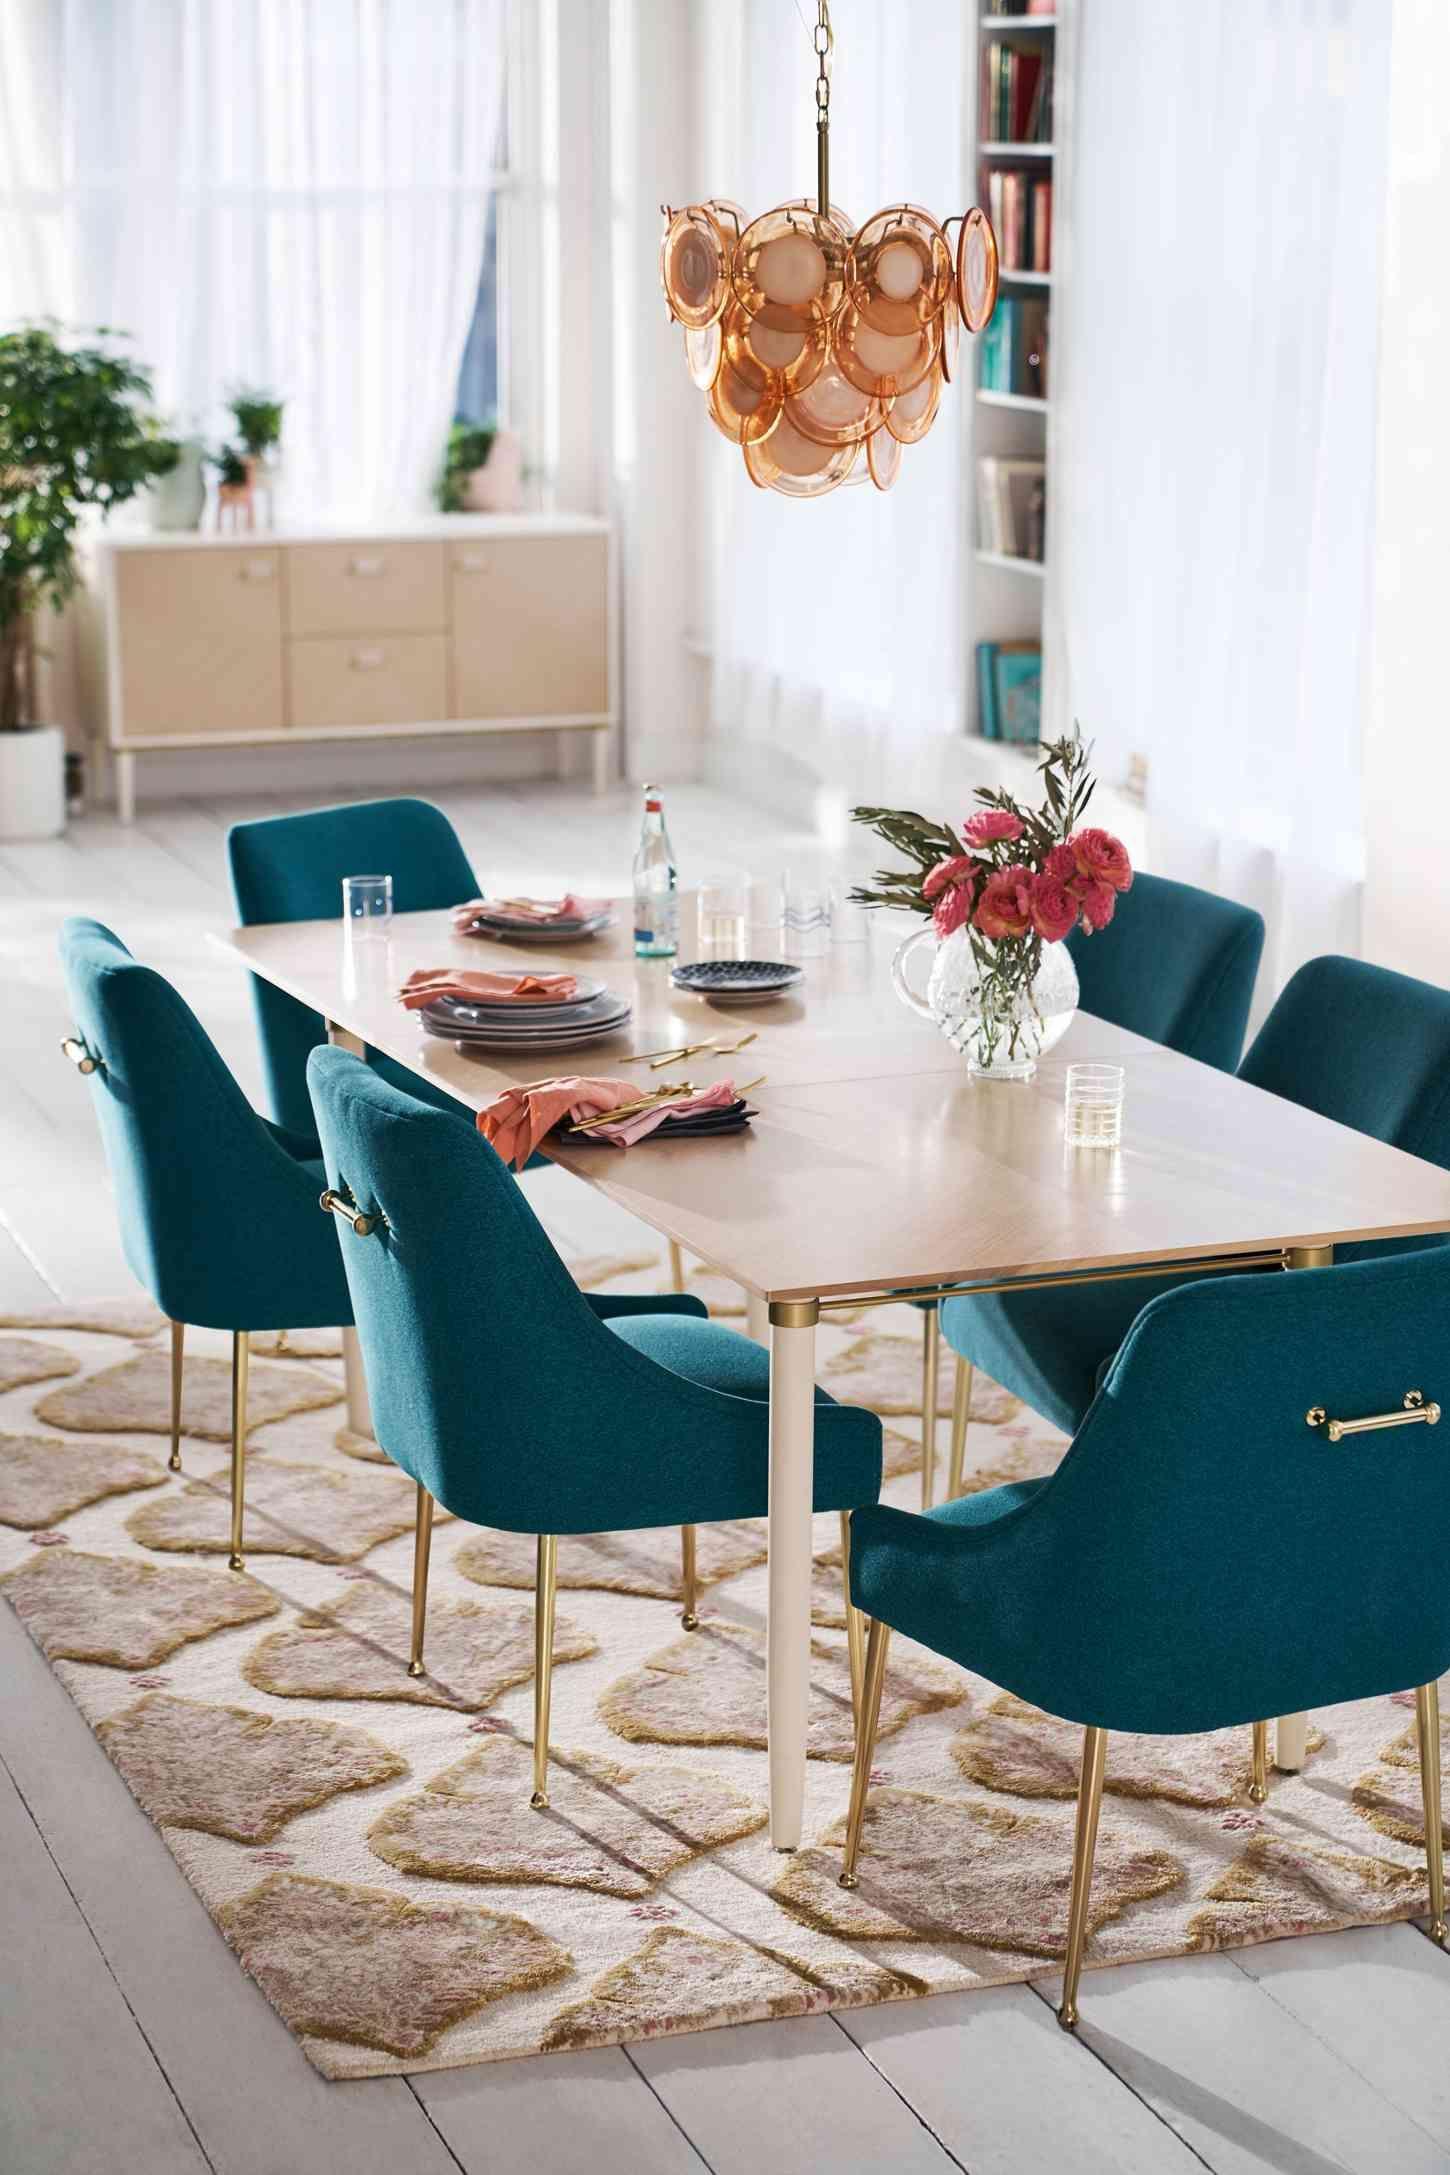 30 Vintage Retro Dining Table Design Ideas In 1950s Retro Dining